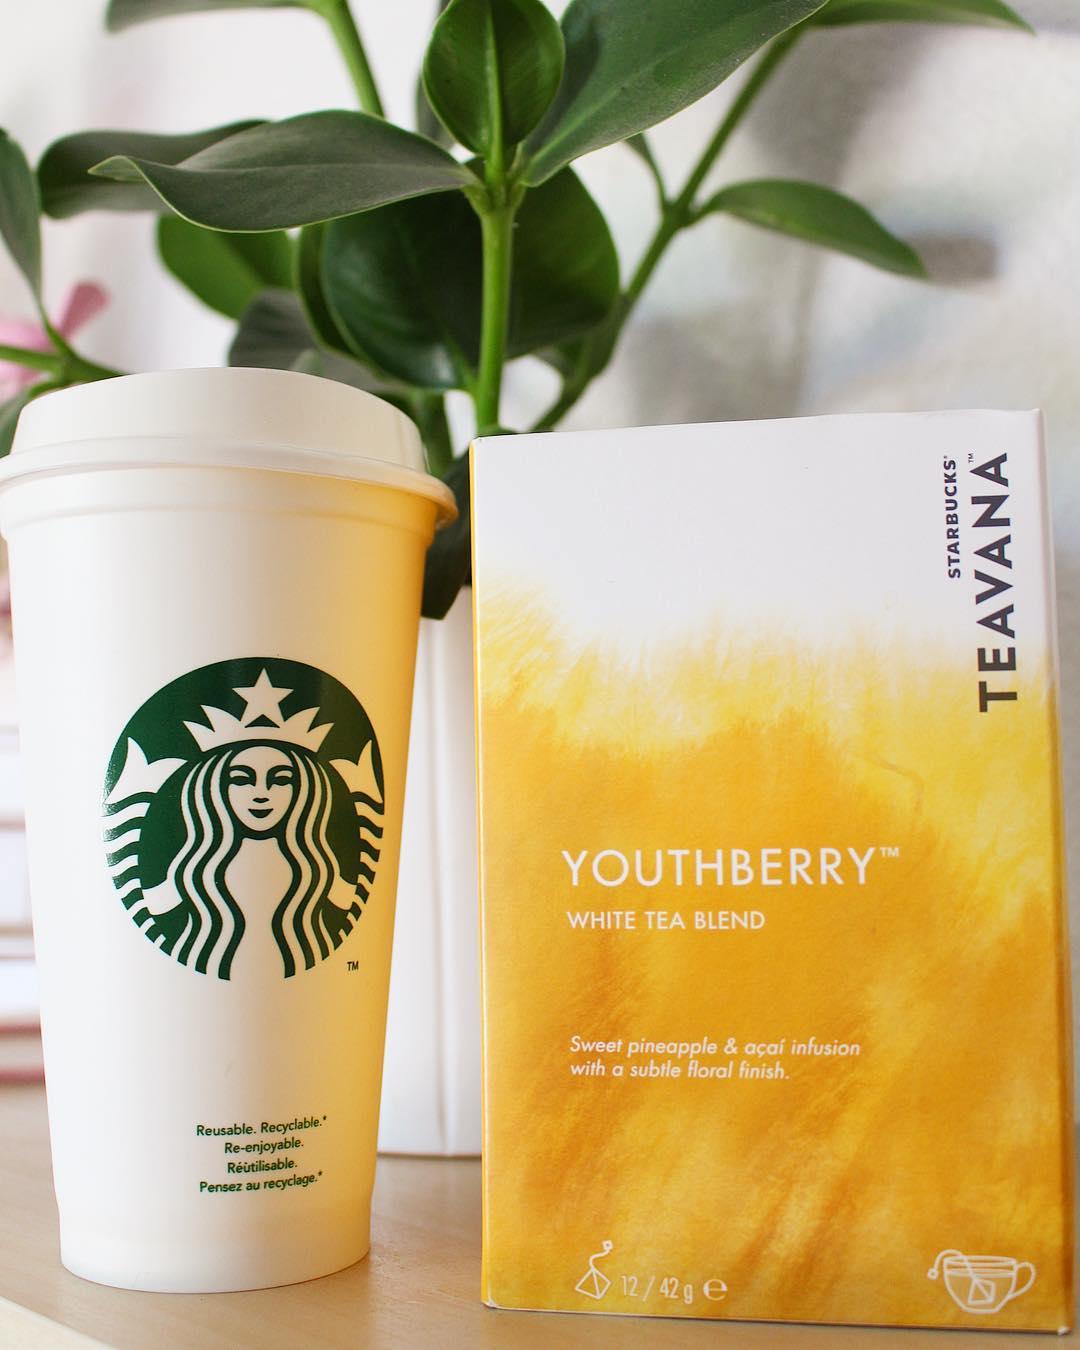 Et oui @starbucksfrance fait aussi du thé ? On goûte ! Merci Starbucks Montpellier ??☕️ . ➕ STARBUCKS • coffee shop ?Montpellier (34)?? . __________ #starbucks #starbuckscoffee #starbucksmontpellier #montpellier #barista #torrefacteur #cafe #coffee #pintademontpellier #blog #blogueuse #coffeeshop #tea #whitetea #teavana